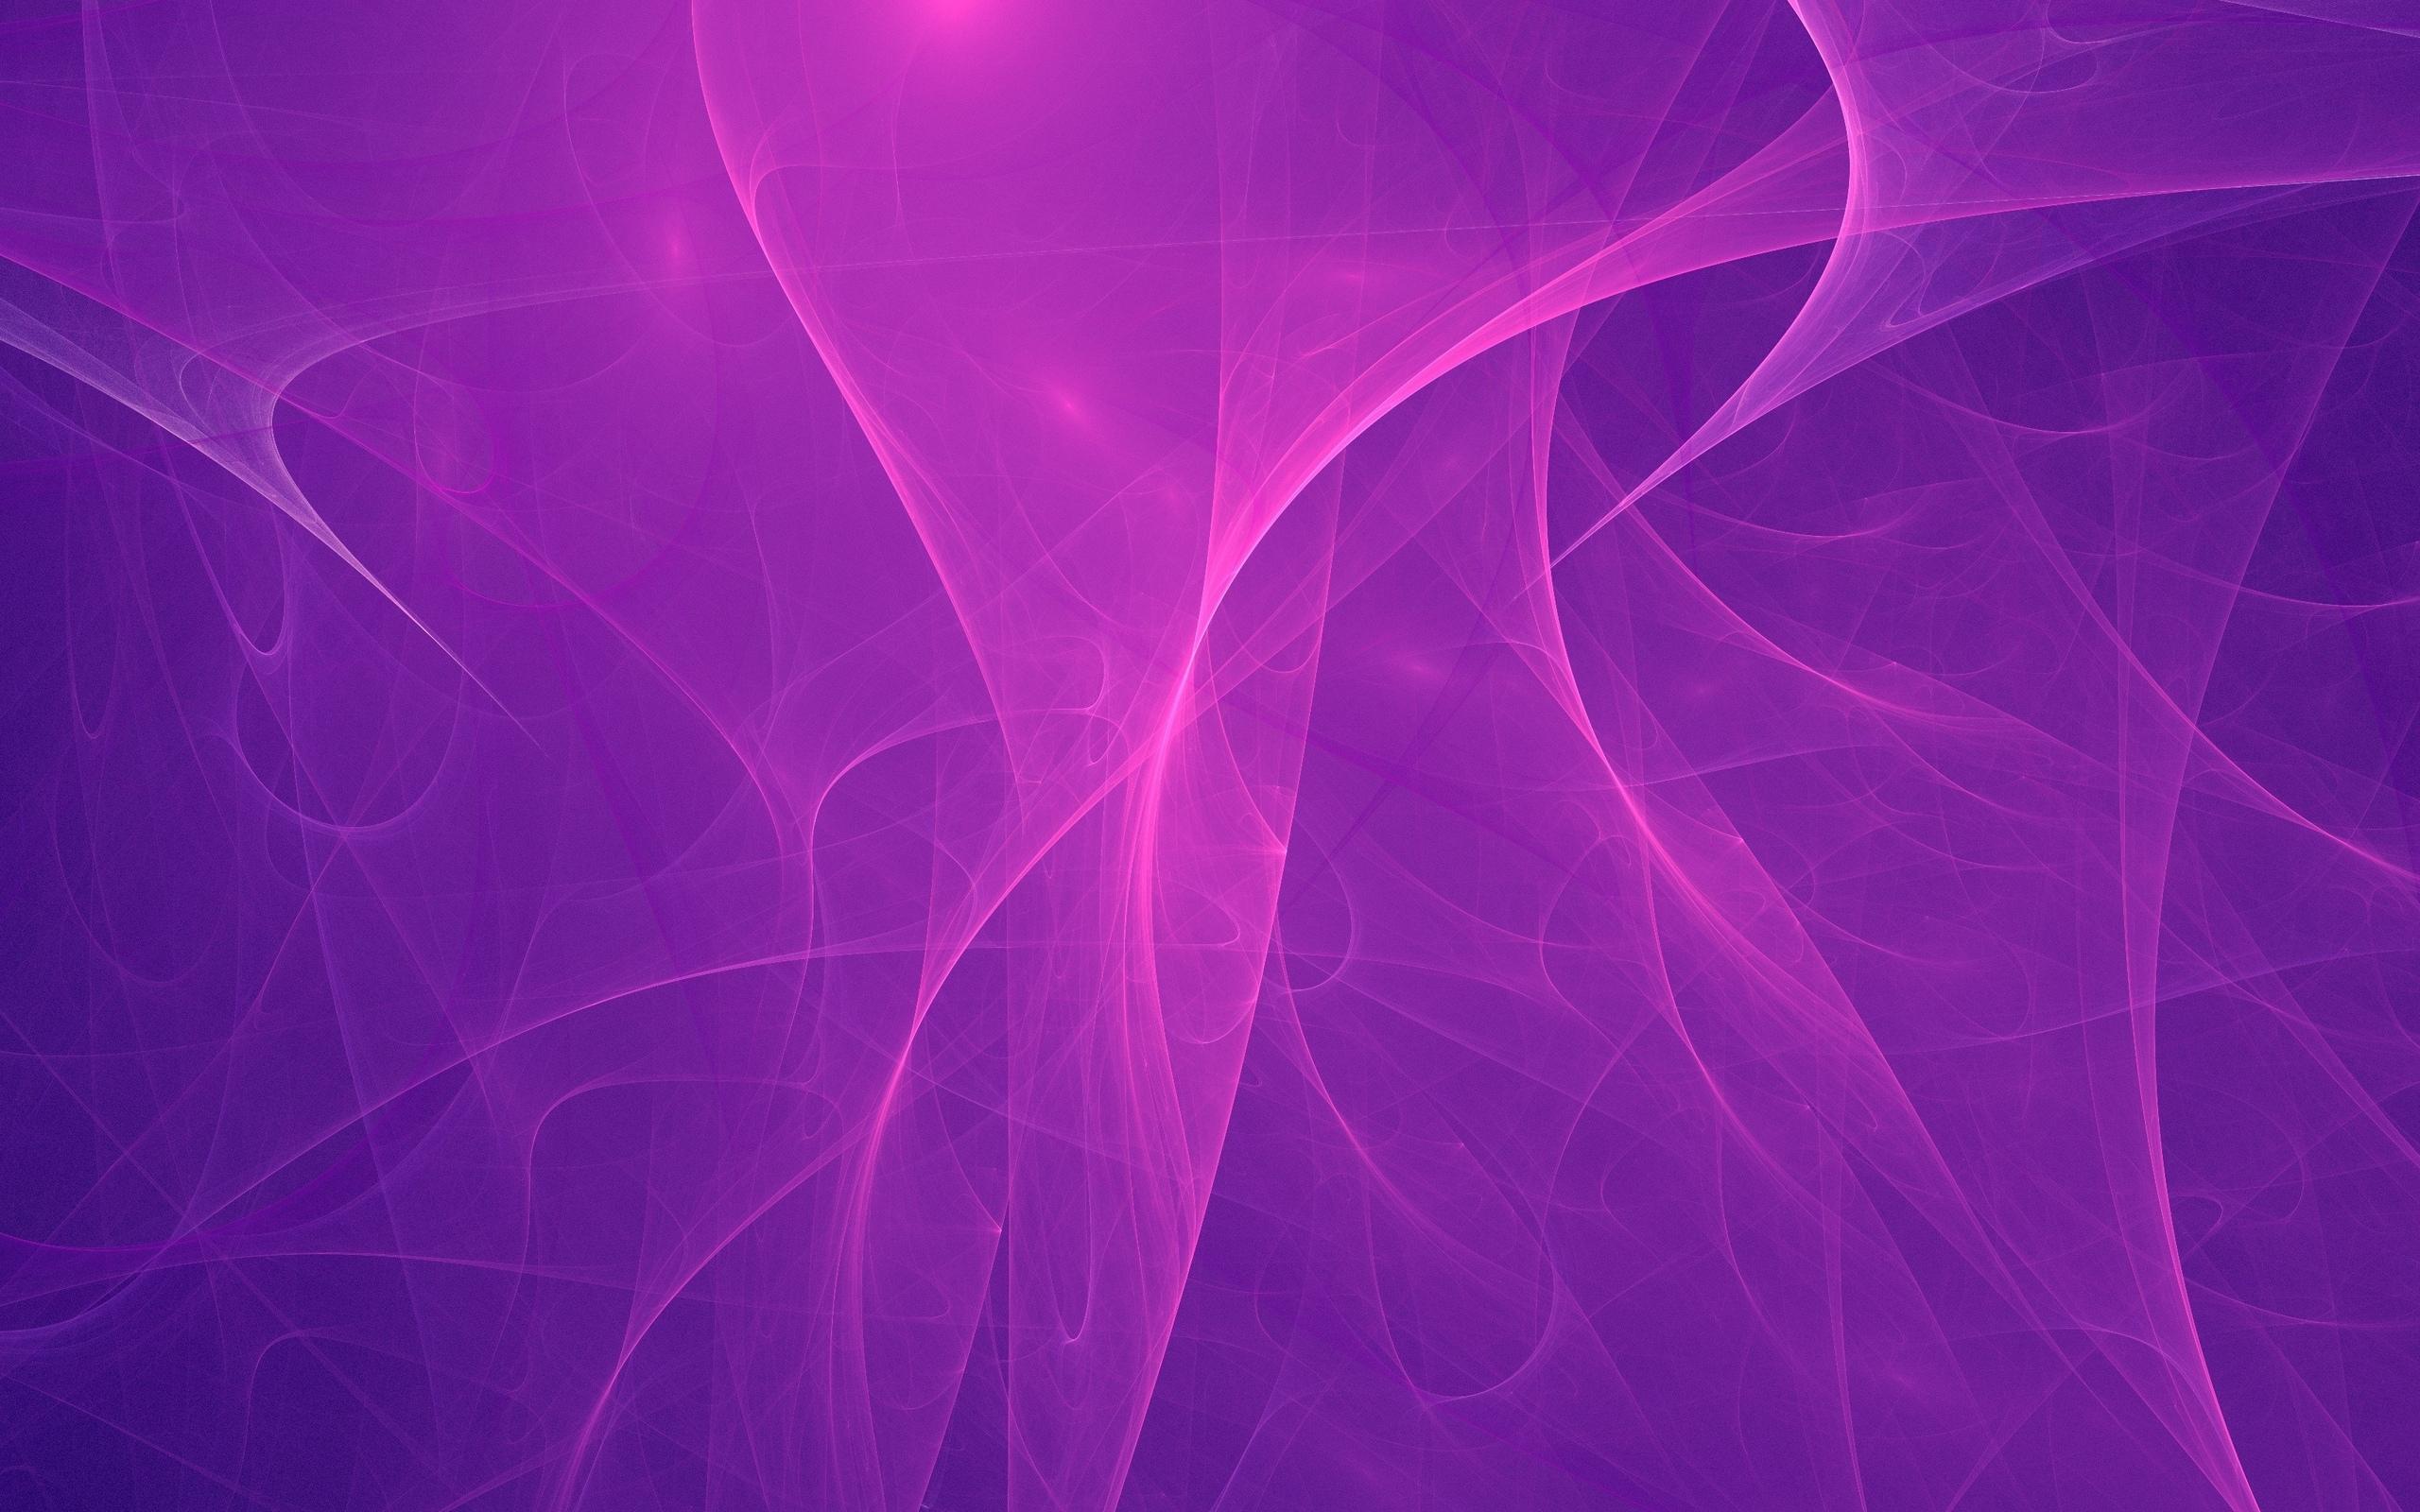 Wallpaper : purple, blurred, texture, circle, magenta, light